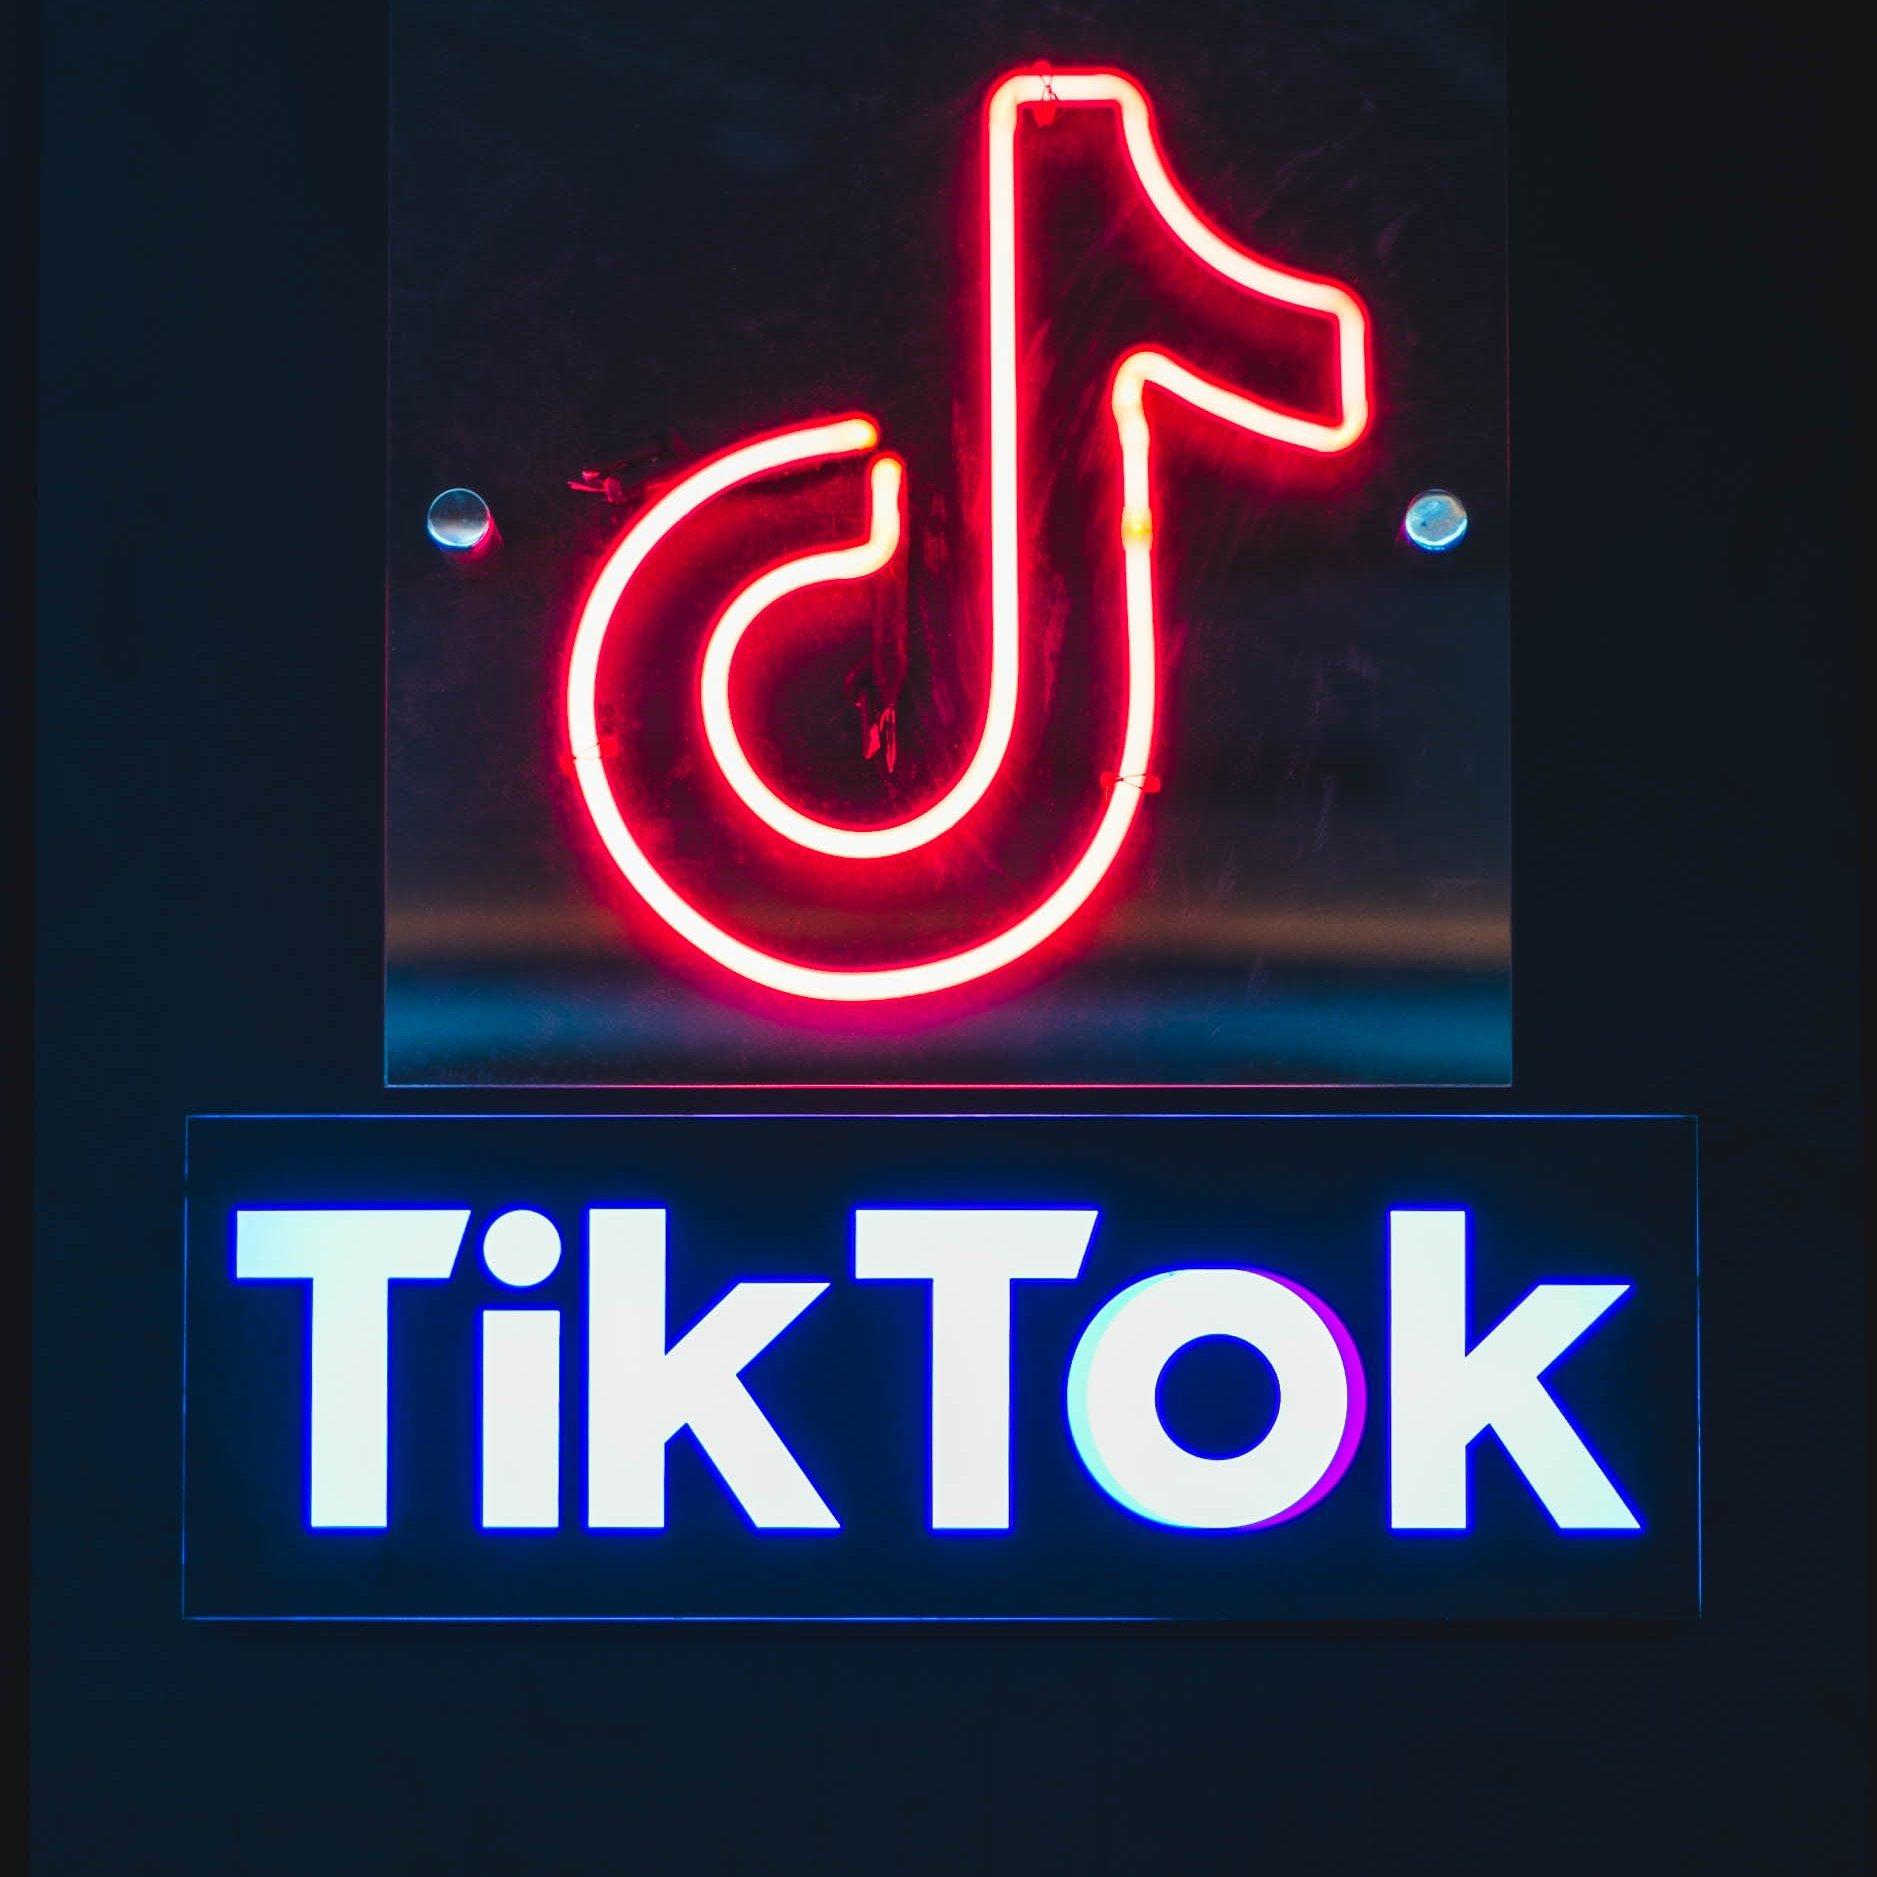 Travel15s On Twitter Travel Sound Of The Water Tiktokpopuler Tiktok Sea Tiktok Travel Or Down